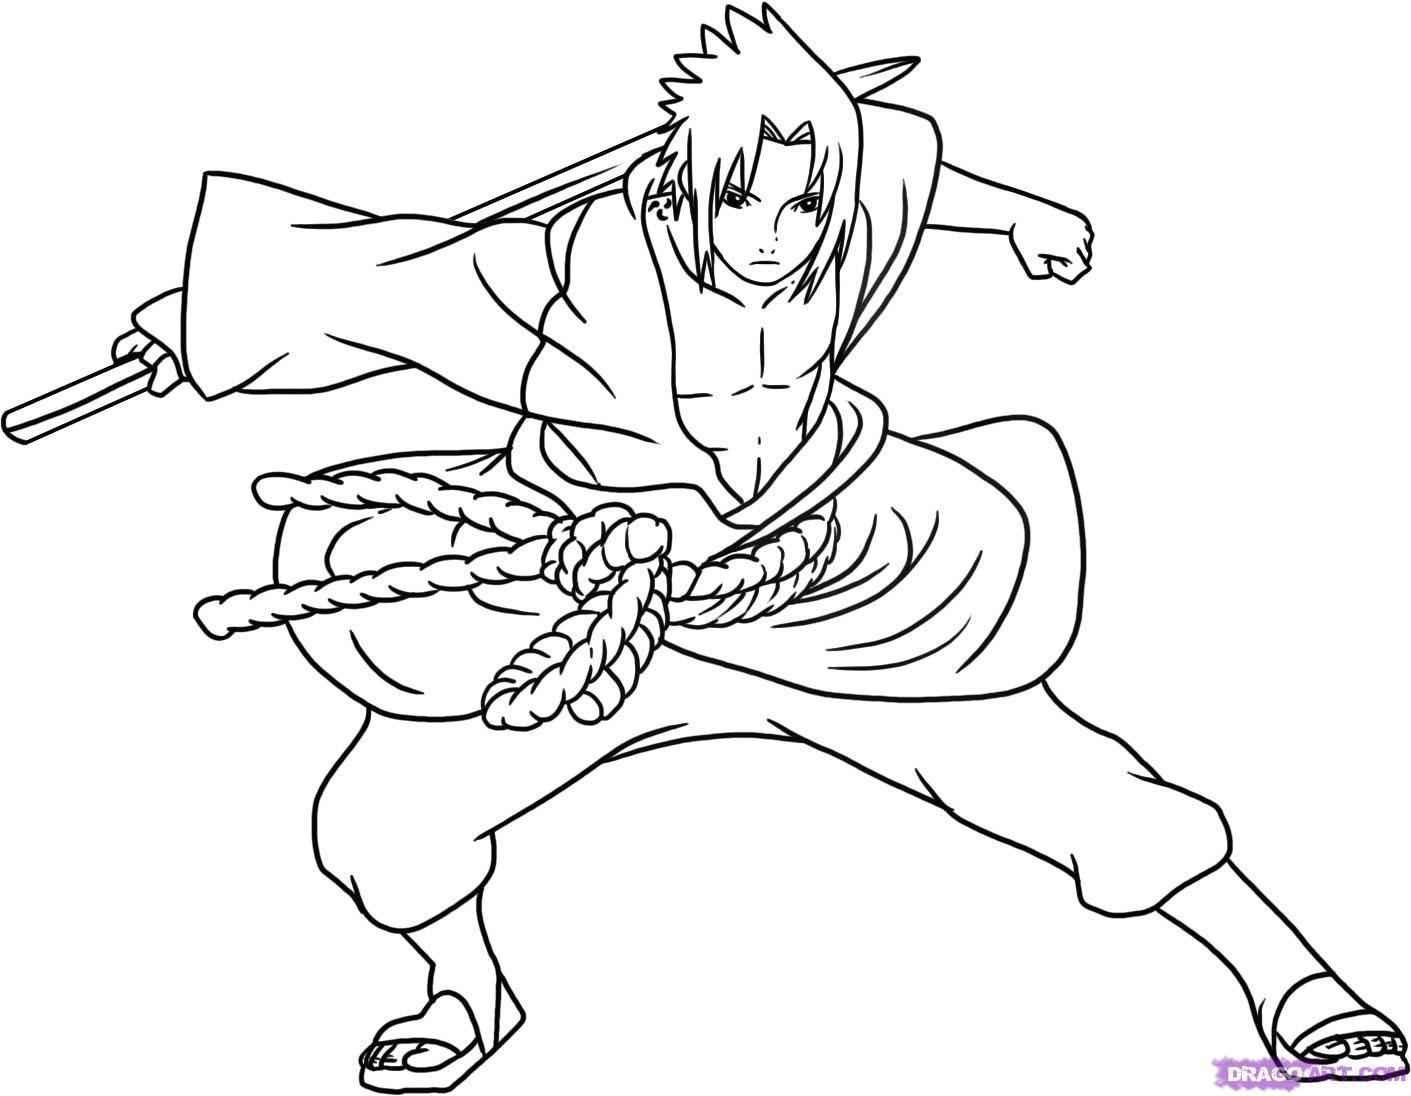 Desenho Para Colorir  Desenho Para Colorir Do Naruto